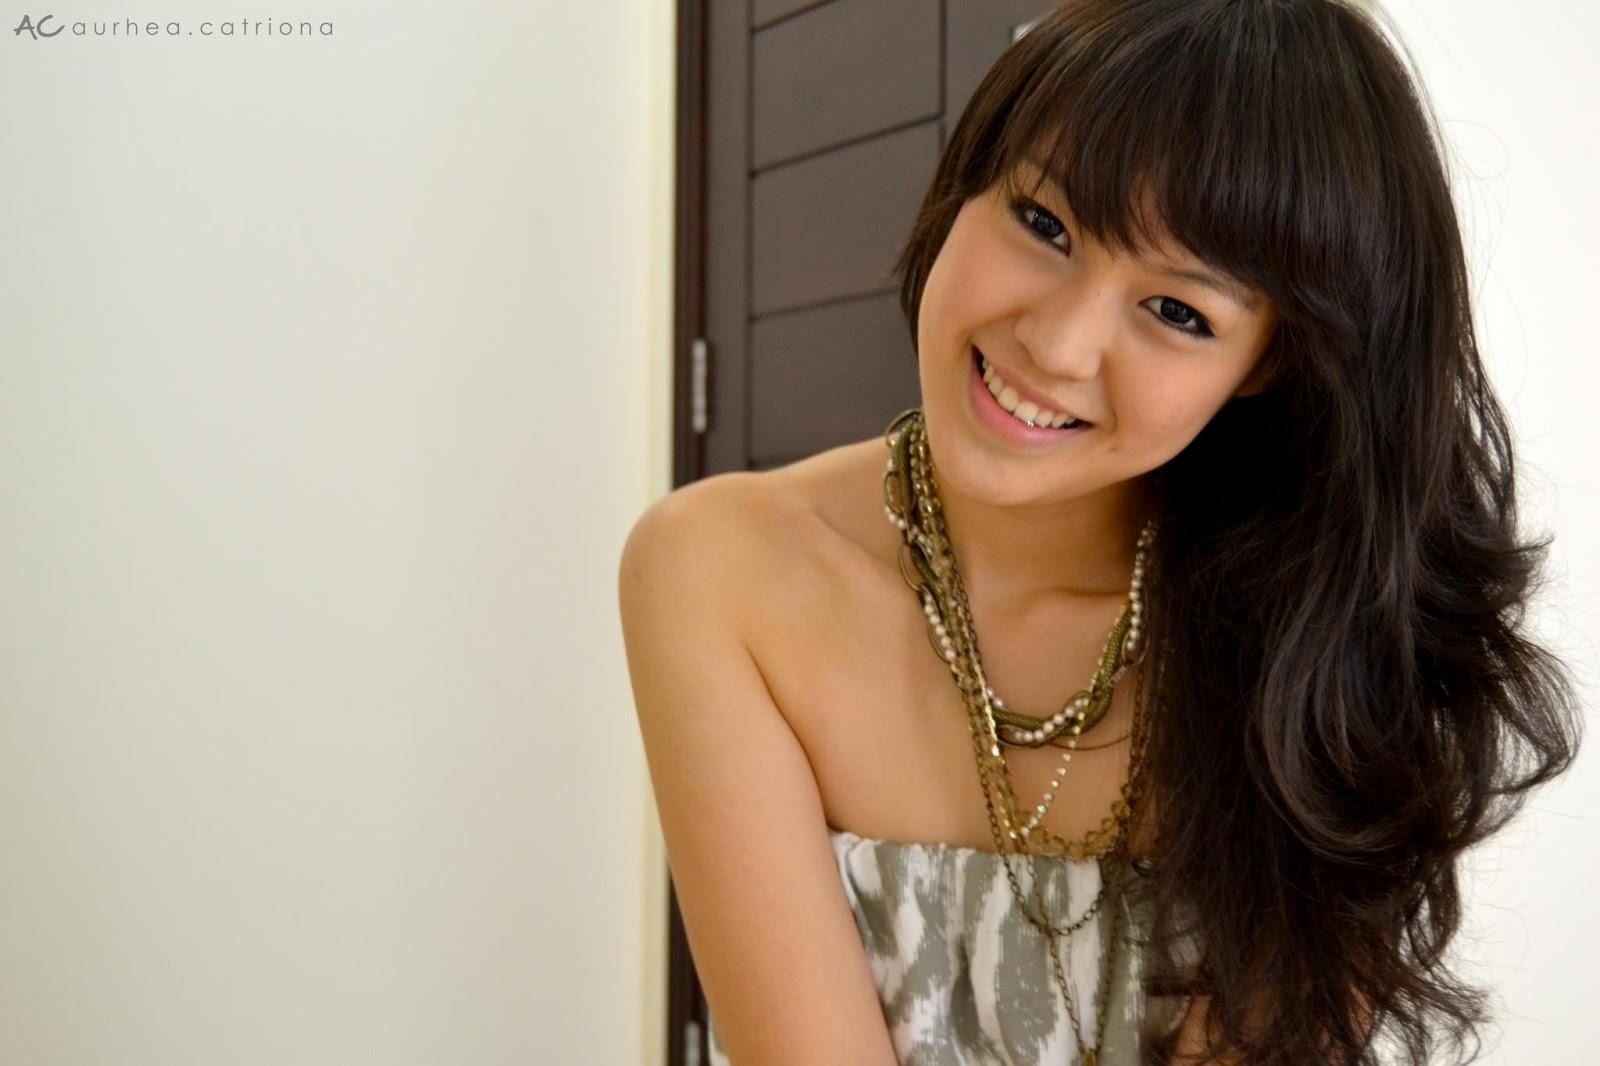 artis baru artis penyanyi cantik bugil